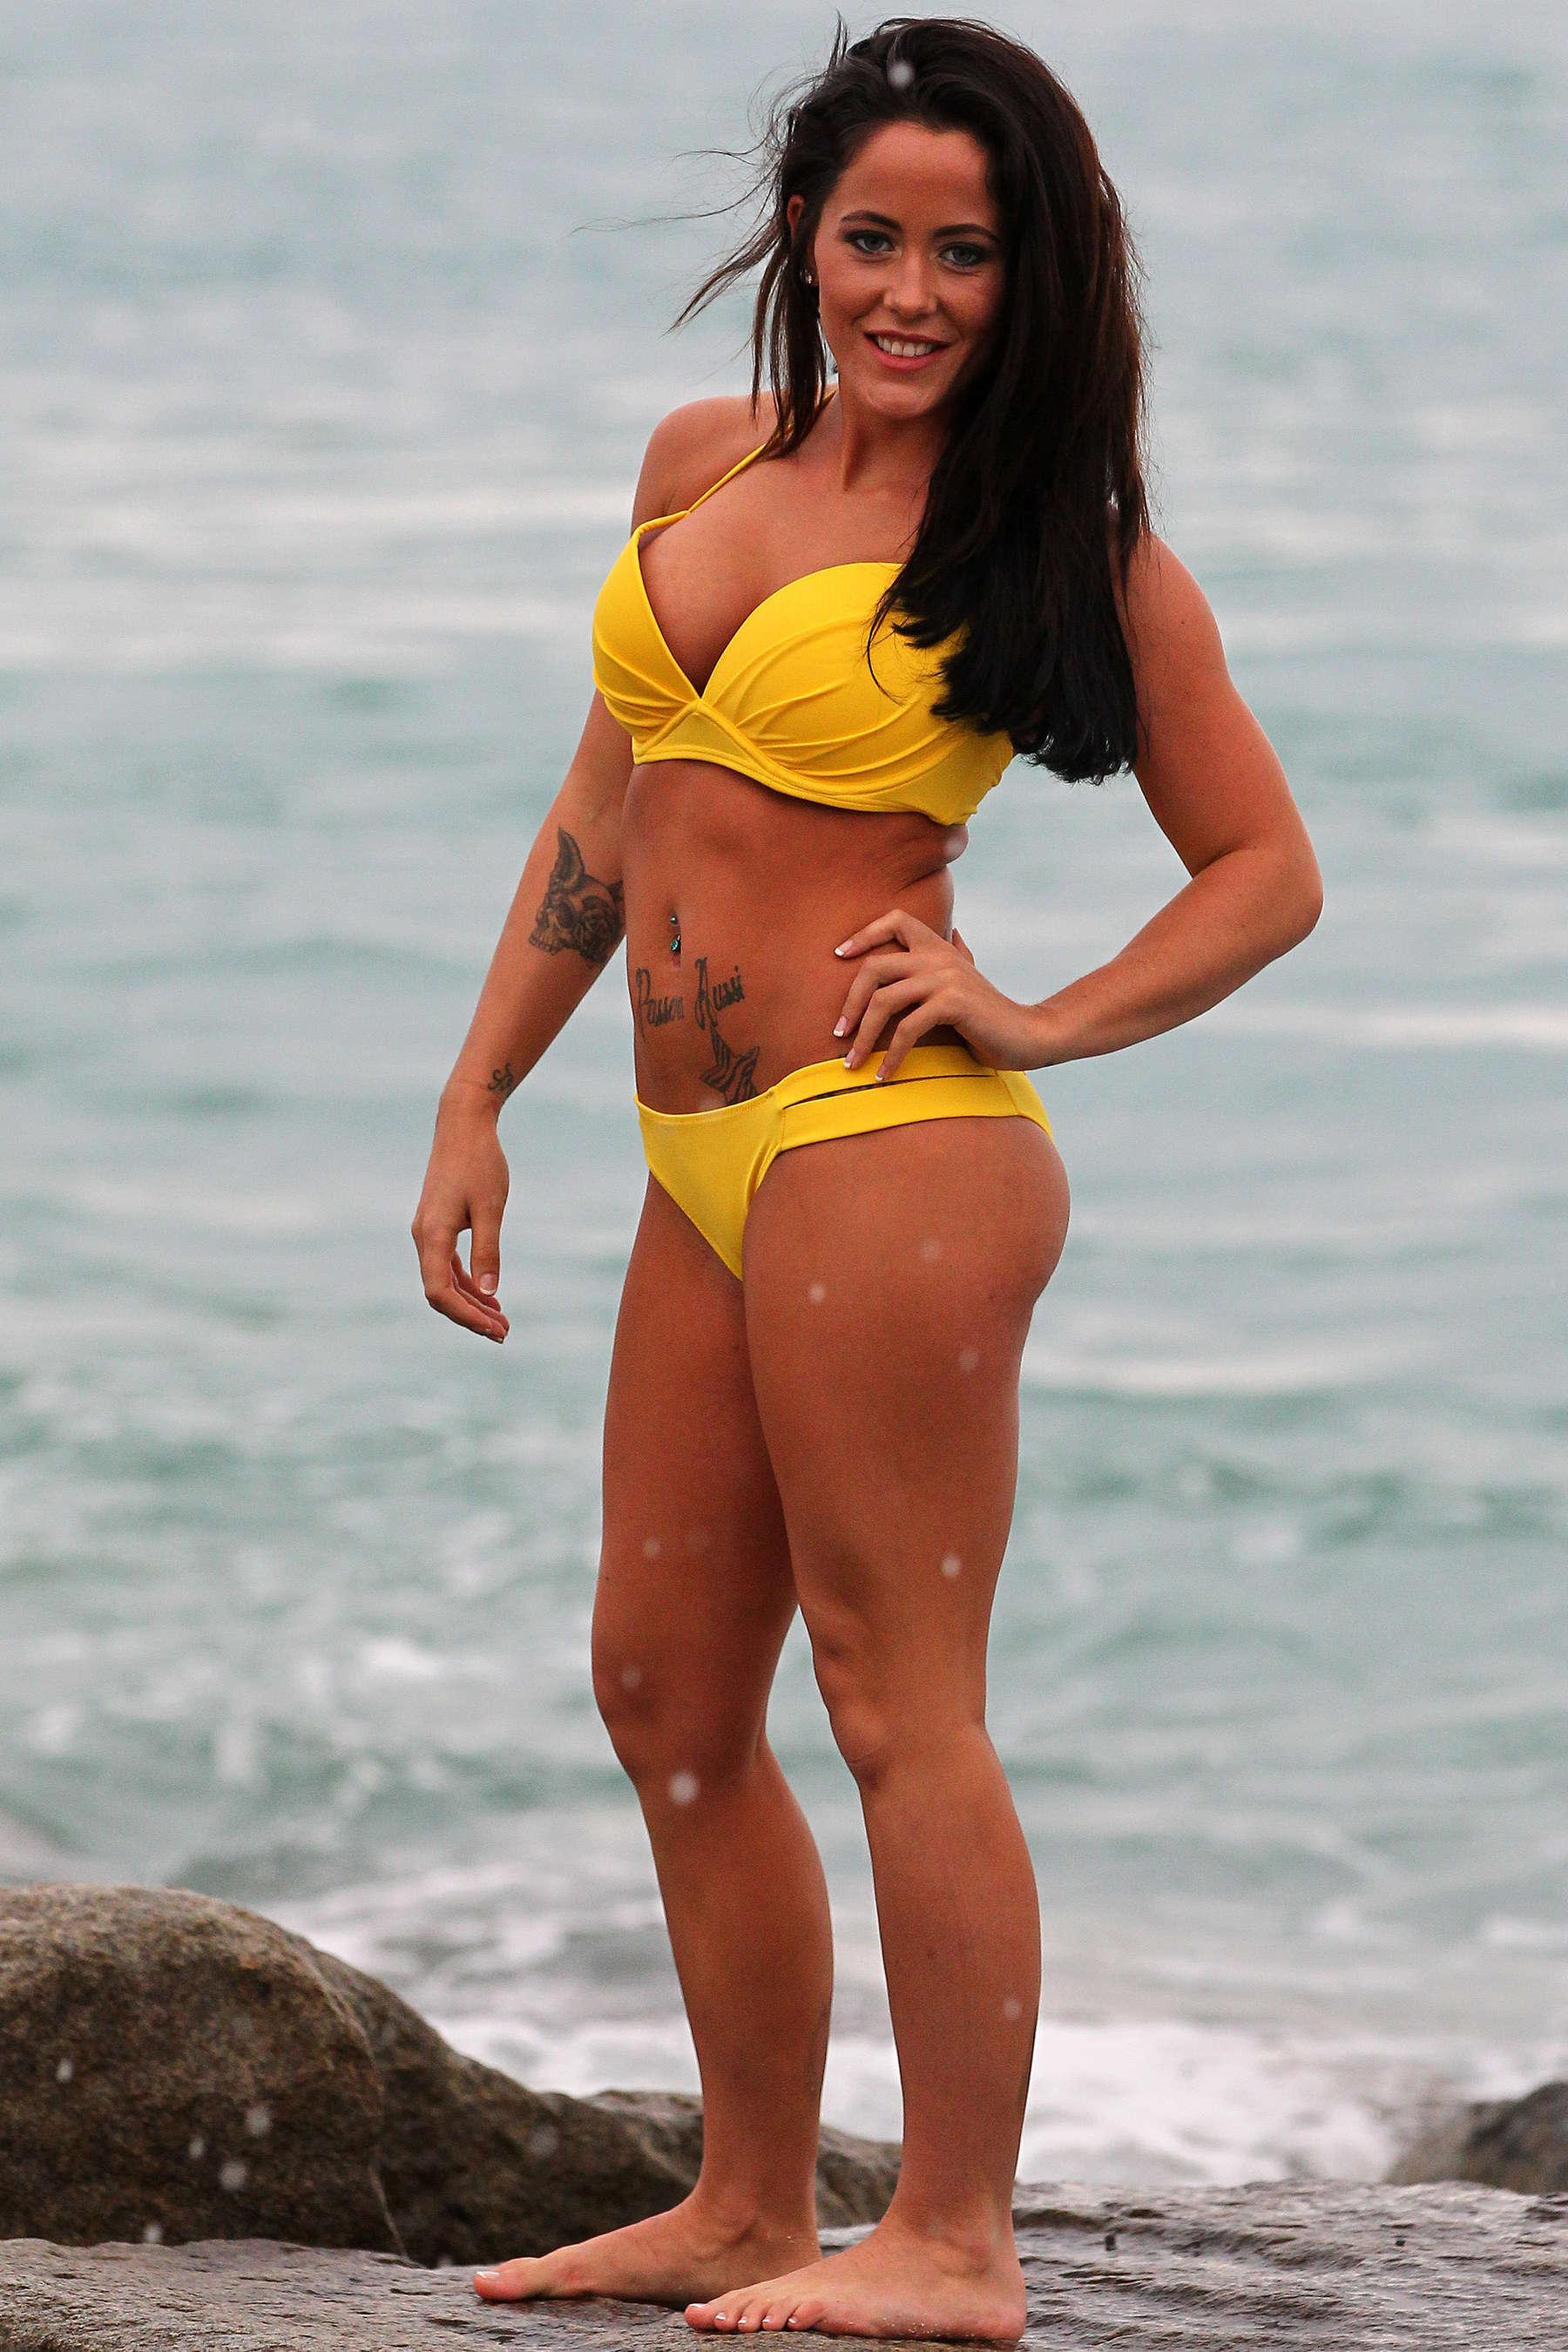 Jenelle Evans in Yellow Bikini Photoshoot in Miami